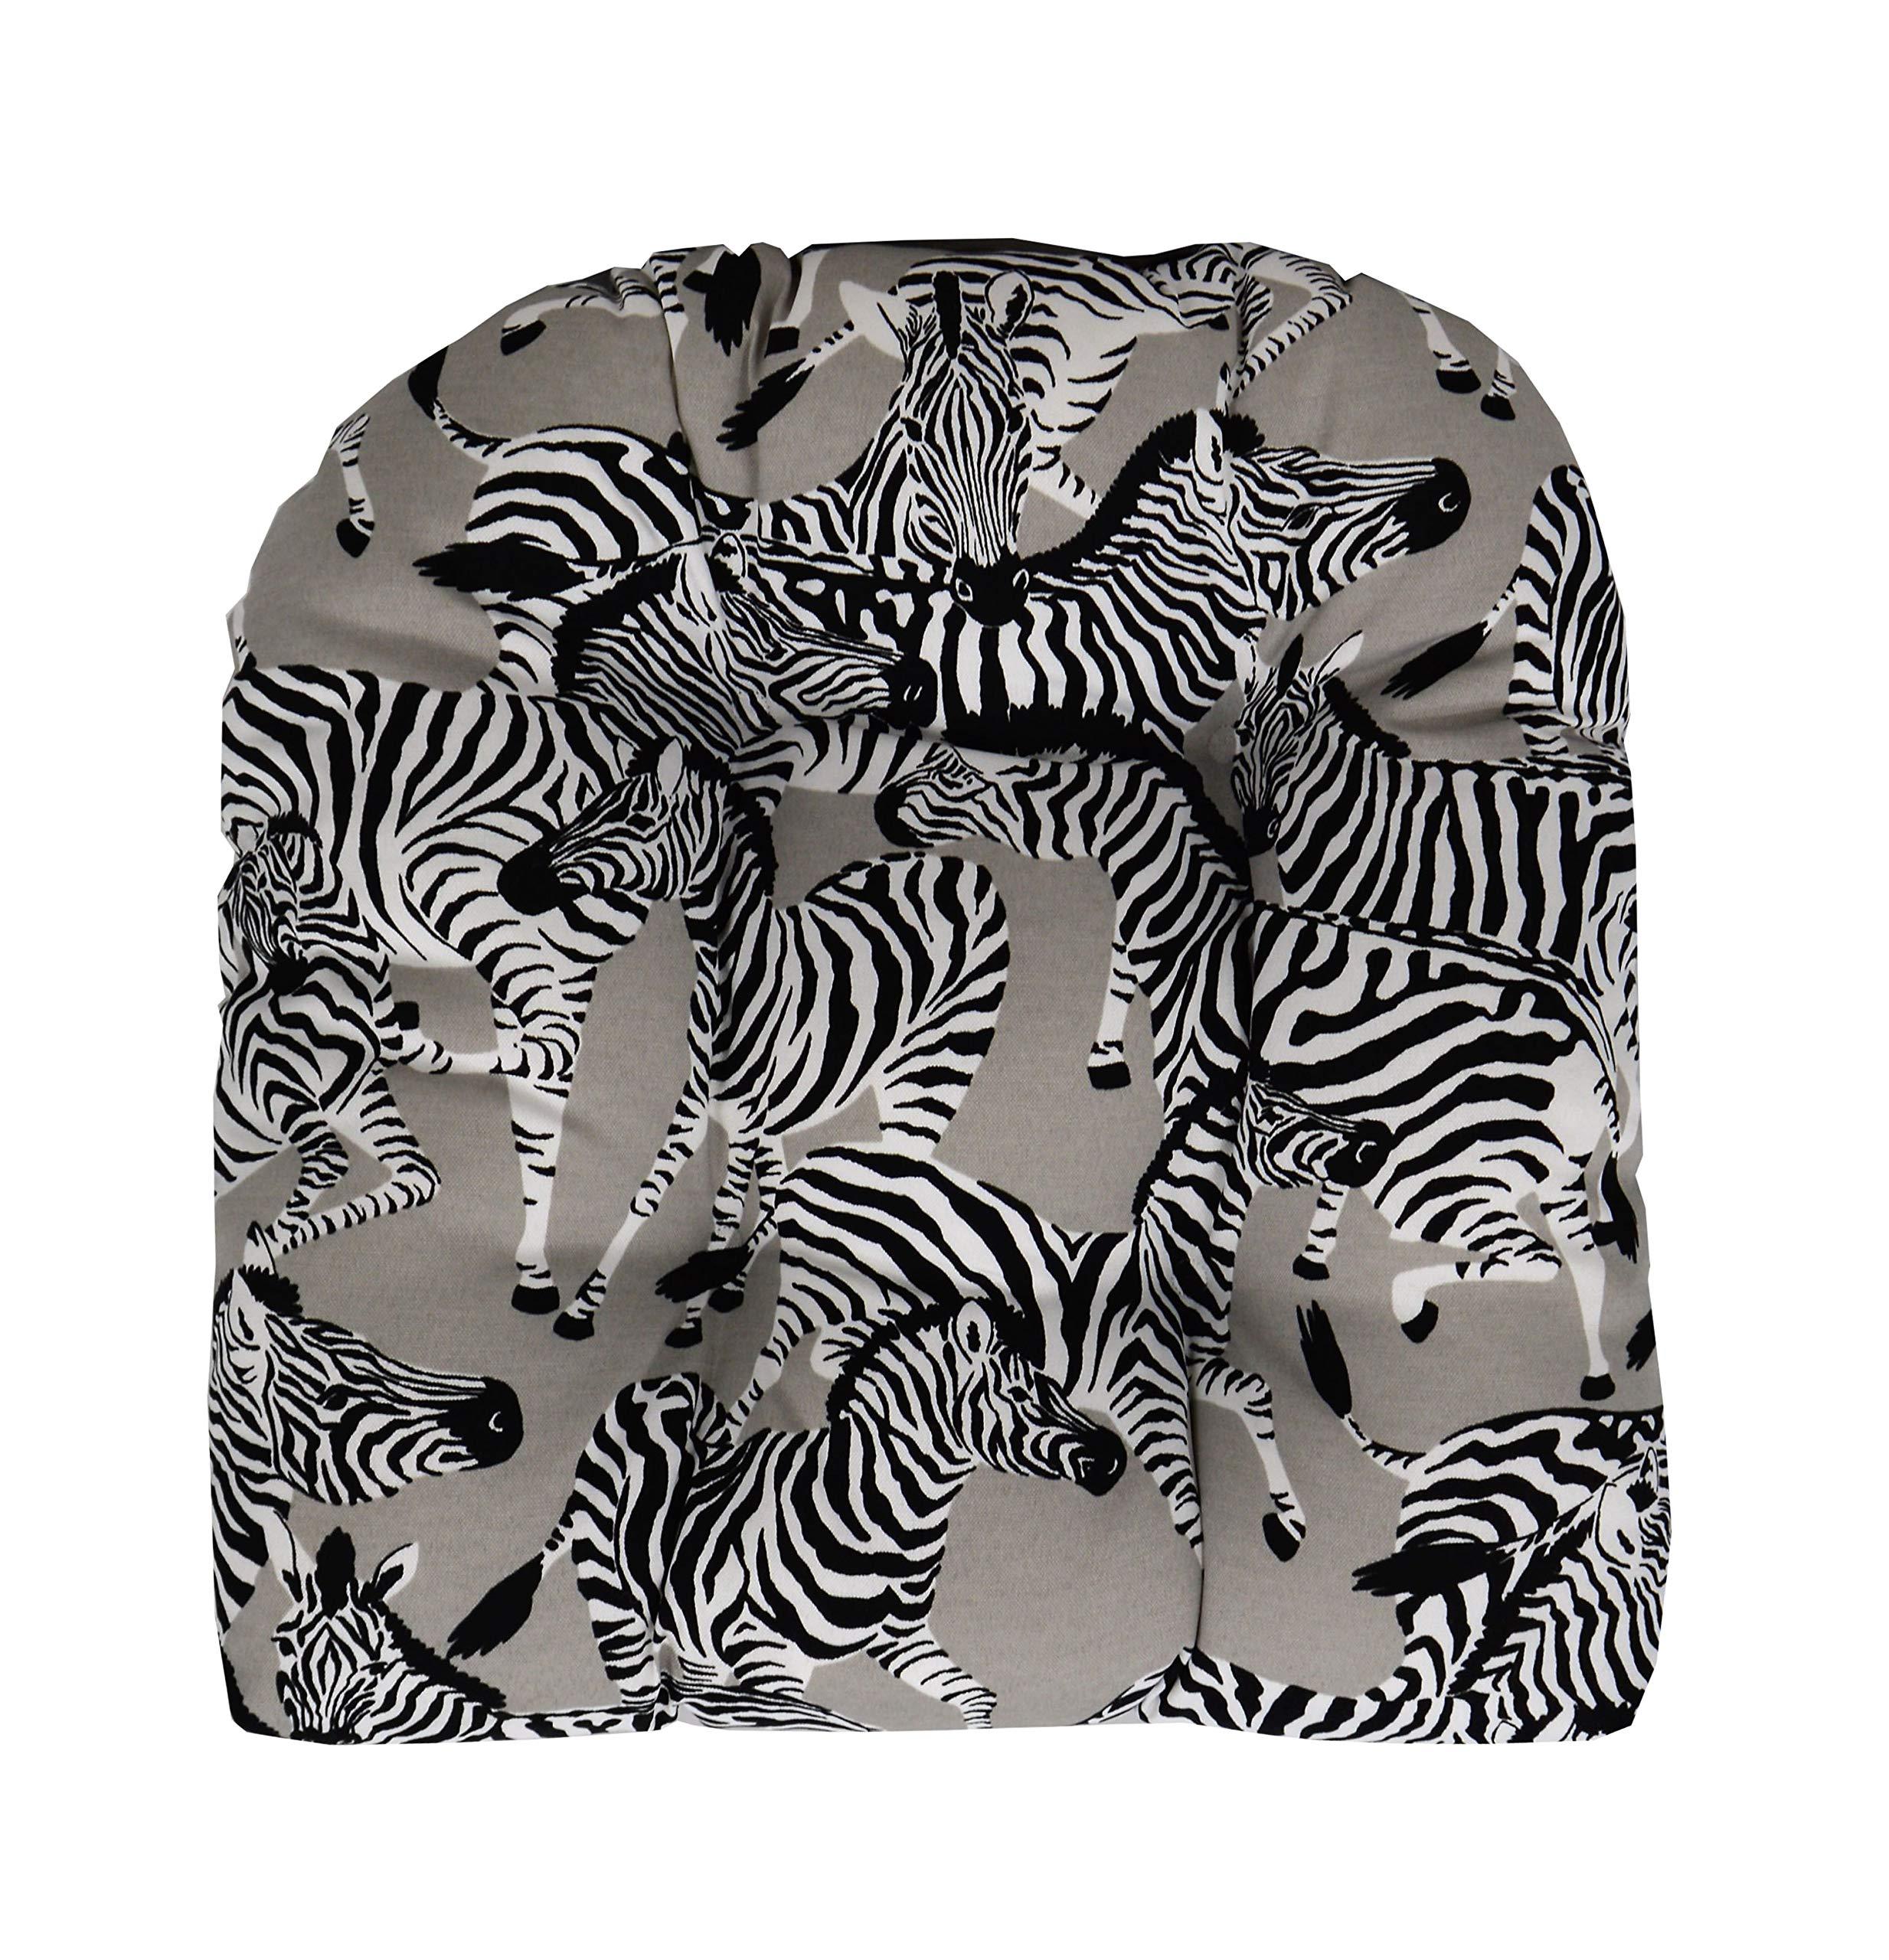 "RSH Décor Indoor Outdoor Wicker Tufted U - Shape Chair Cushion - Black, Grey/Gray & White Zebra Fabric Cushion (19""W x 19""D)"